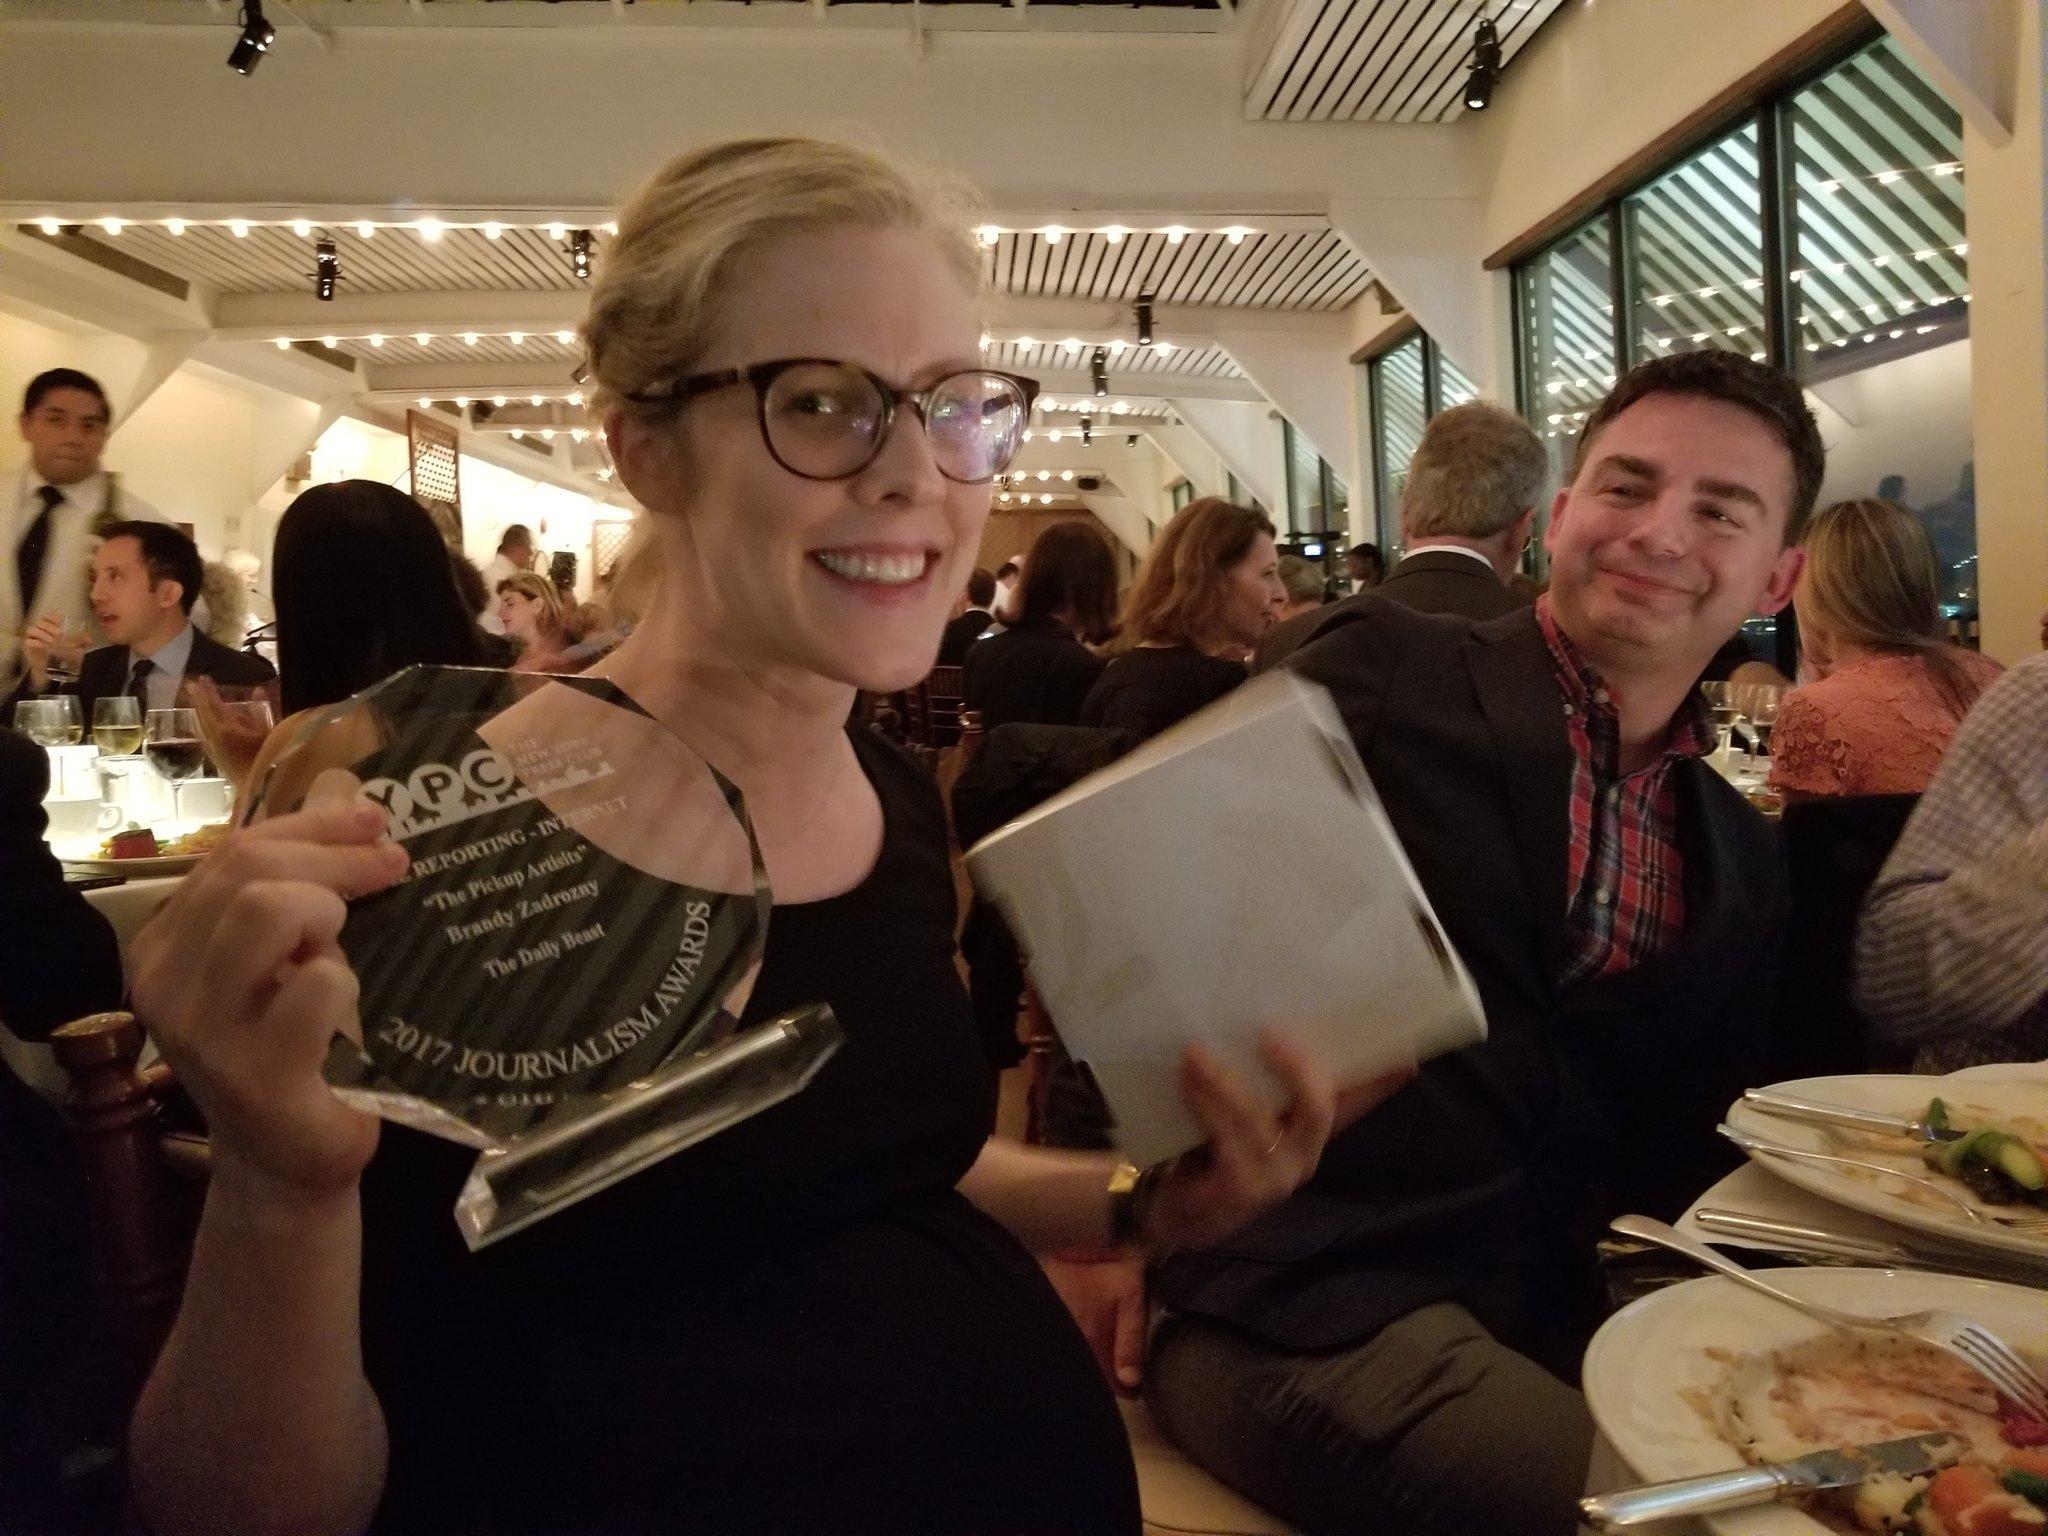 .@BrandyZadrozny picks up NY press club award ... one of three for @thedailybeast tonight! https://t.co/LCUyLNYIah